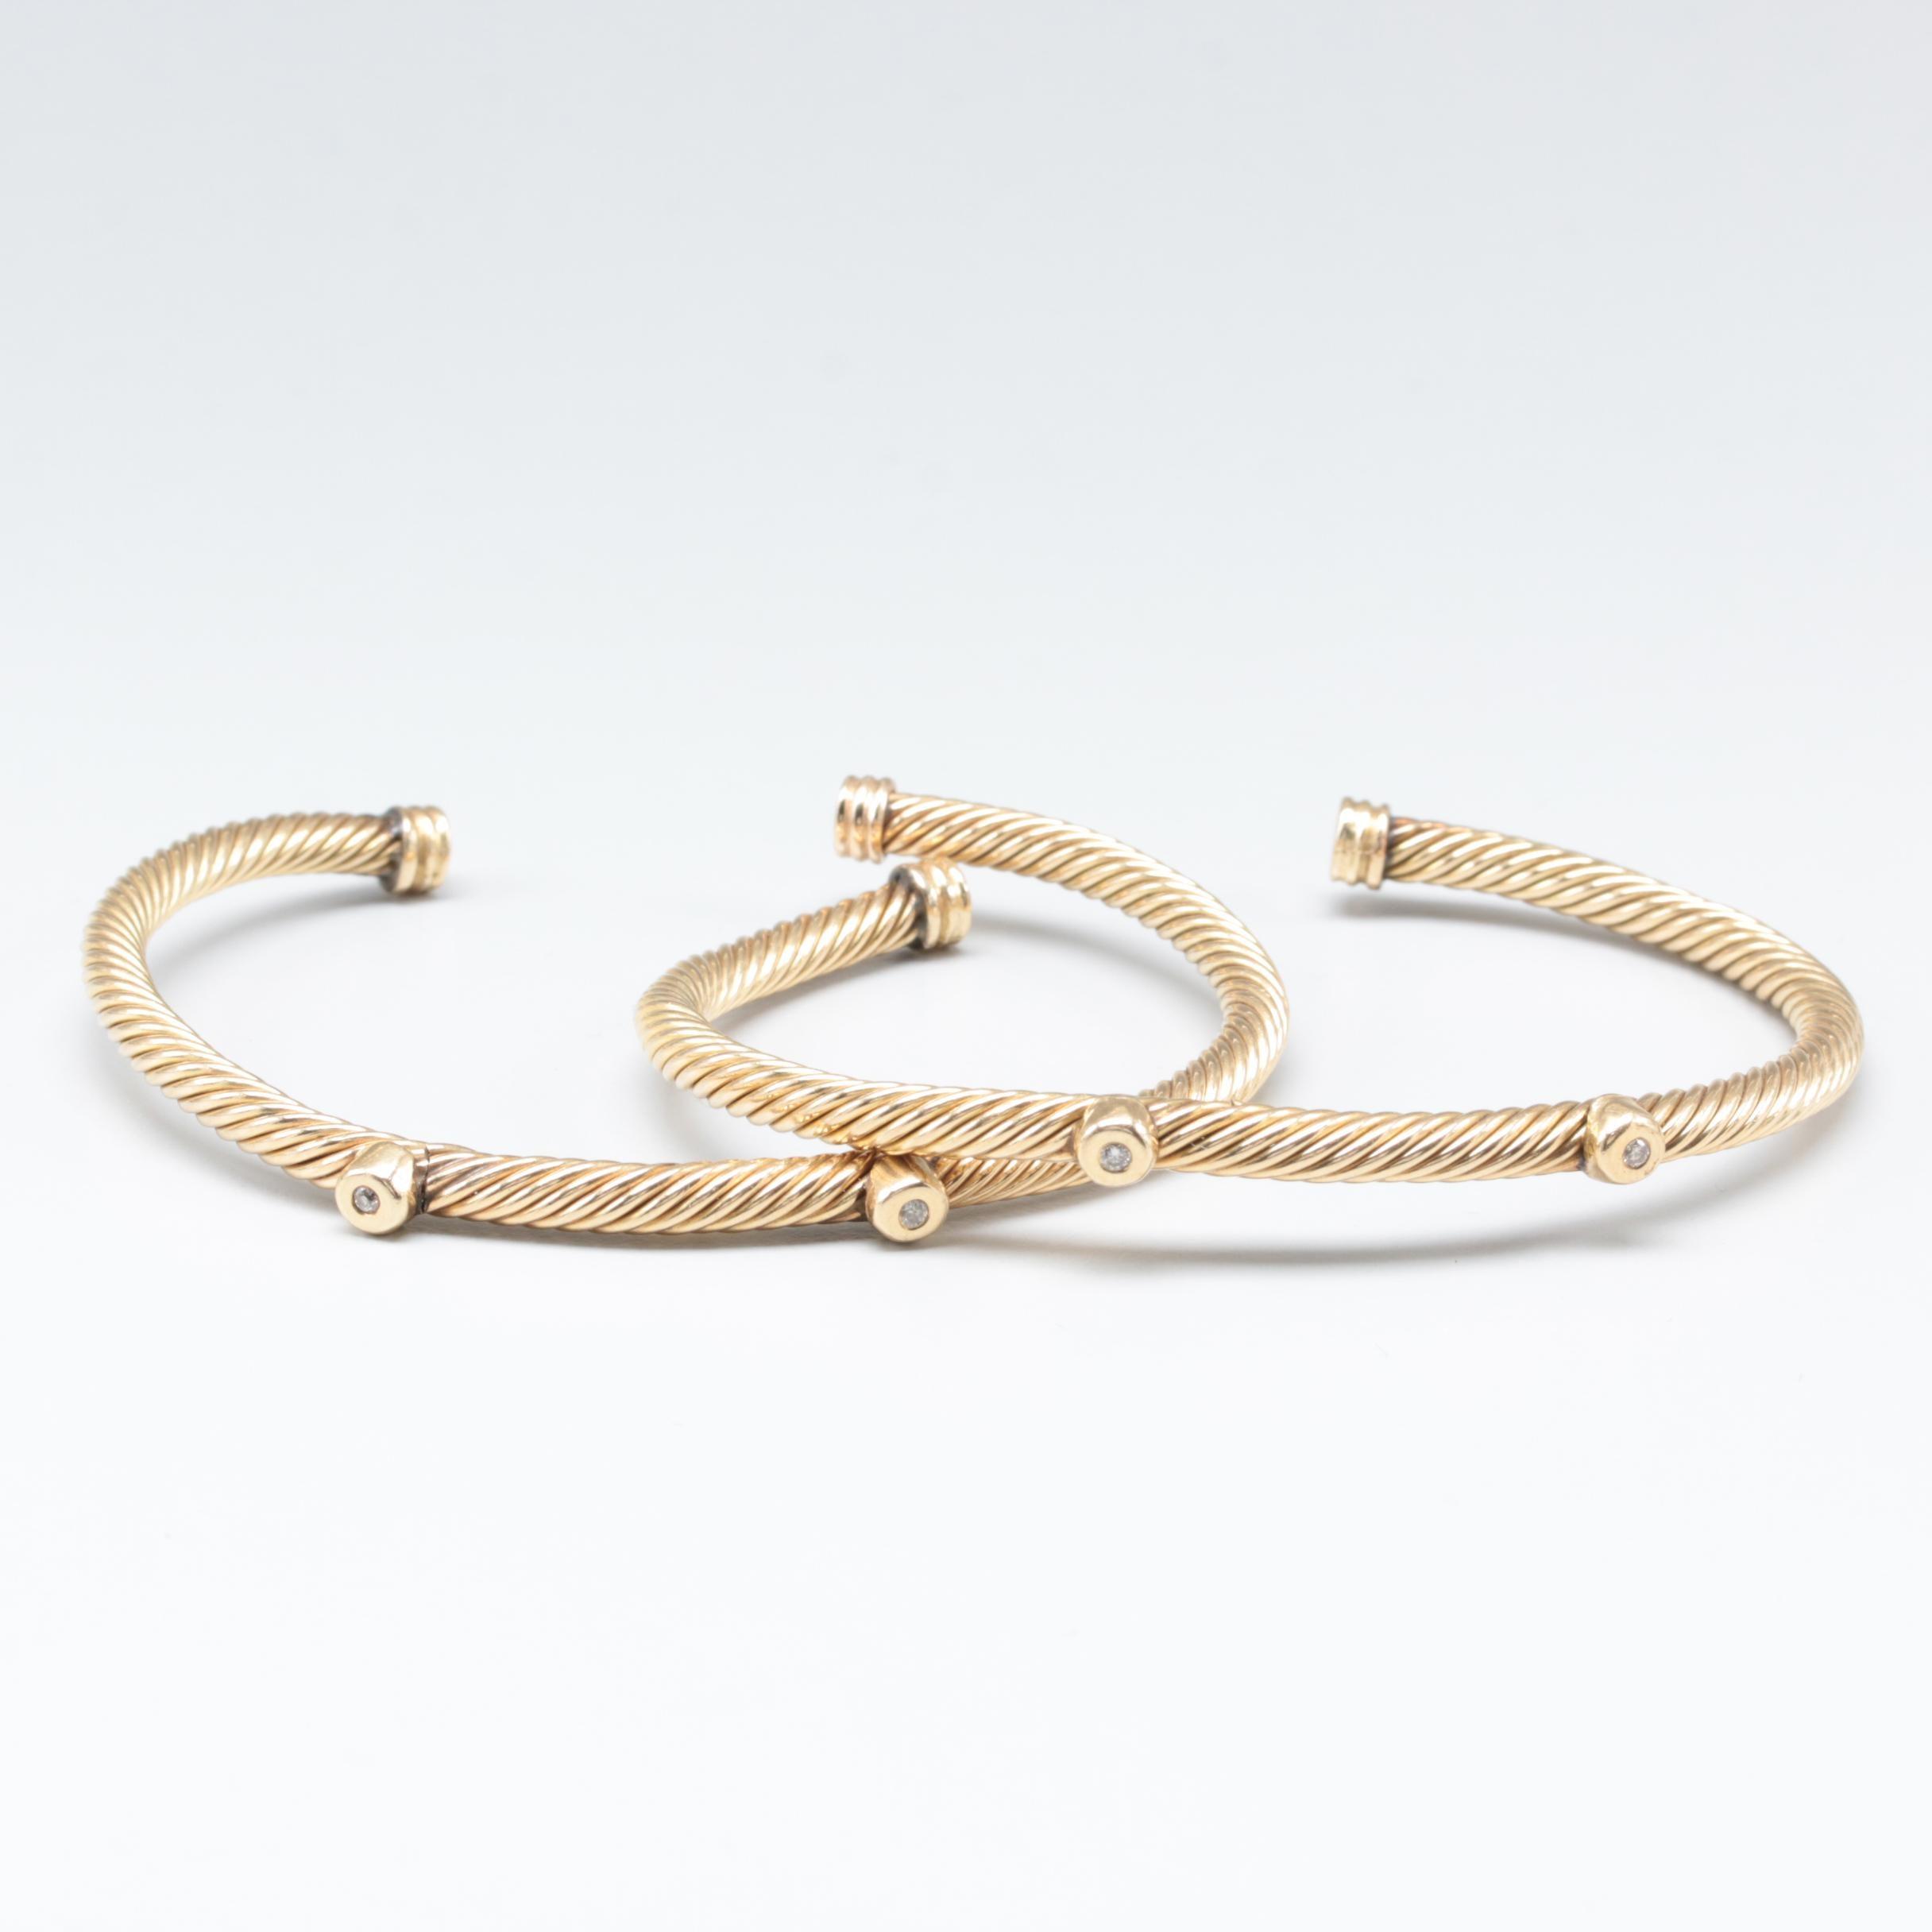 14K Yellow Gold Diamond Cable Bracelet Selection